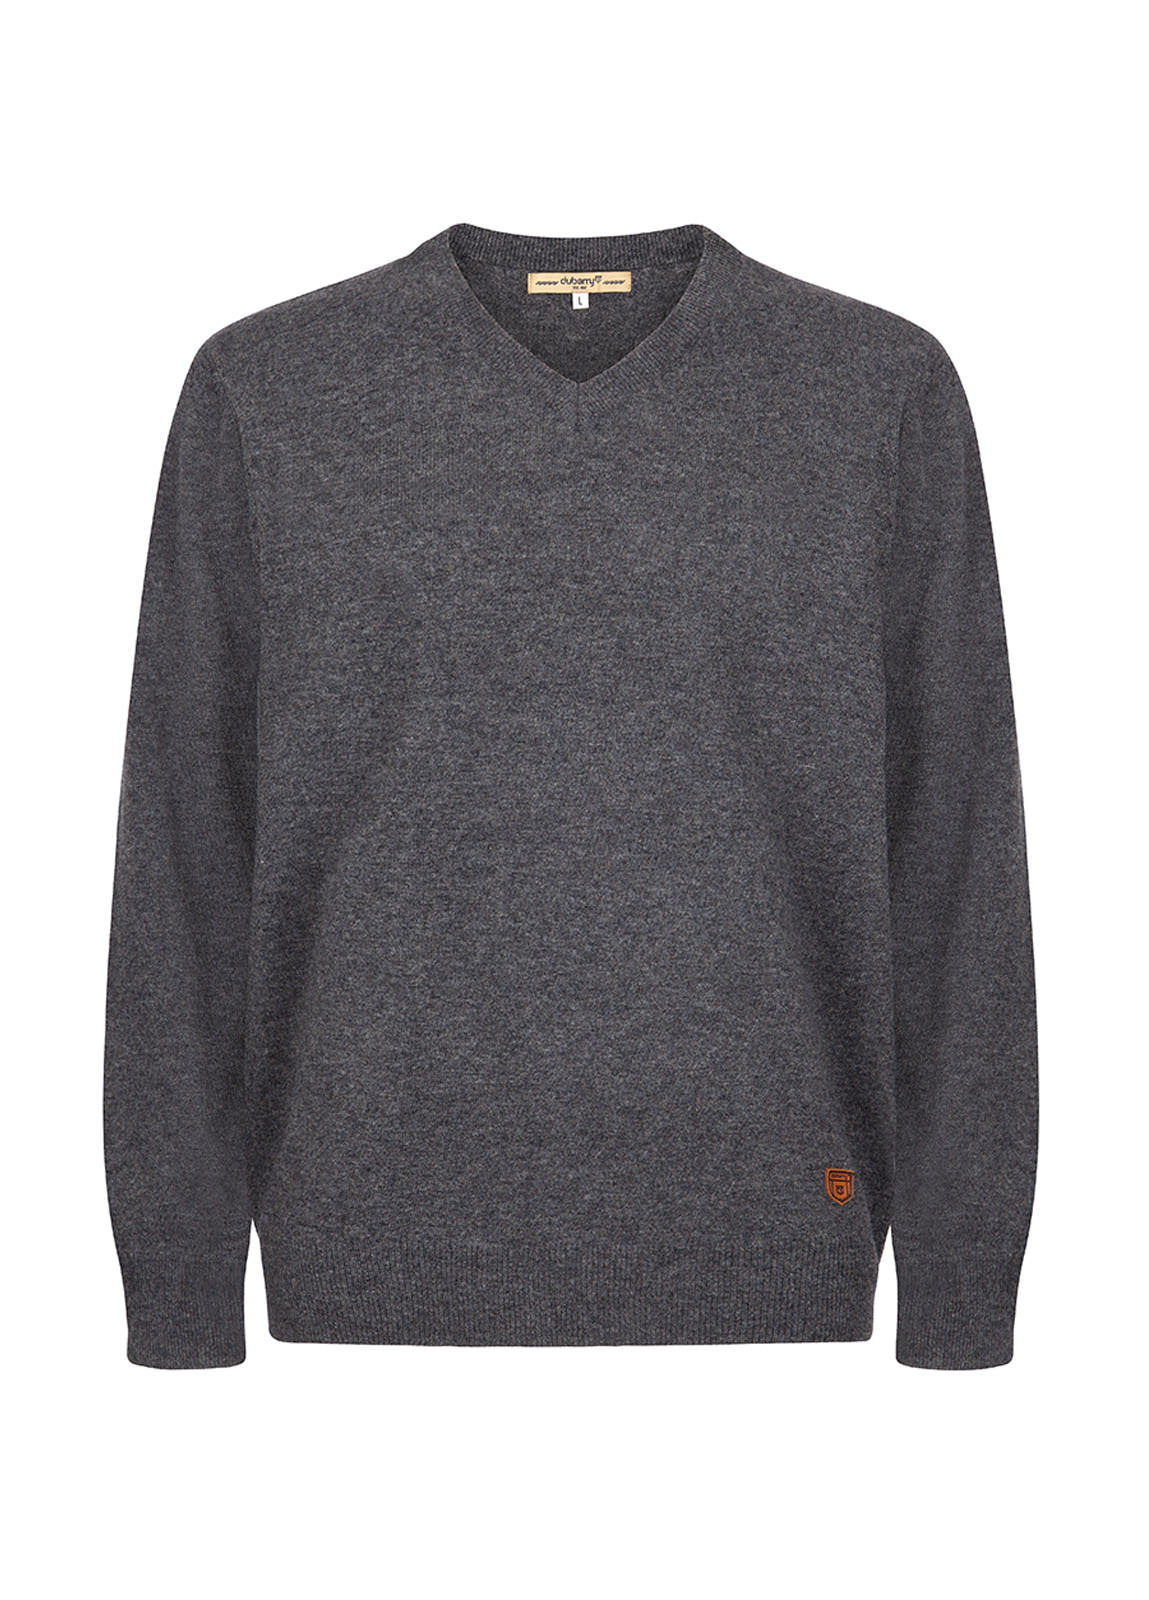 Dubarry_ Brennan Men's Knitted Sweater  - Graphite_Image_2